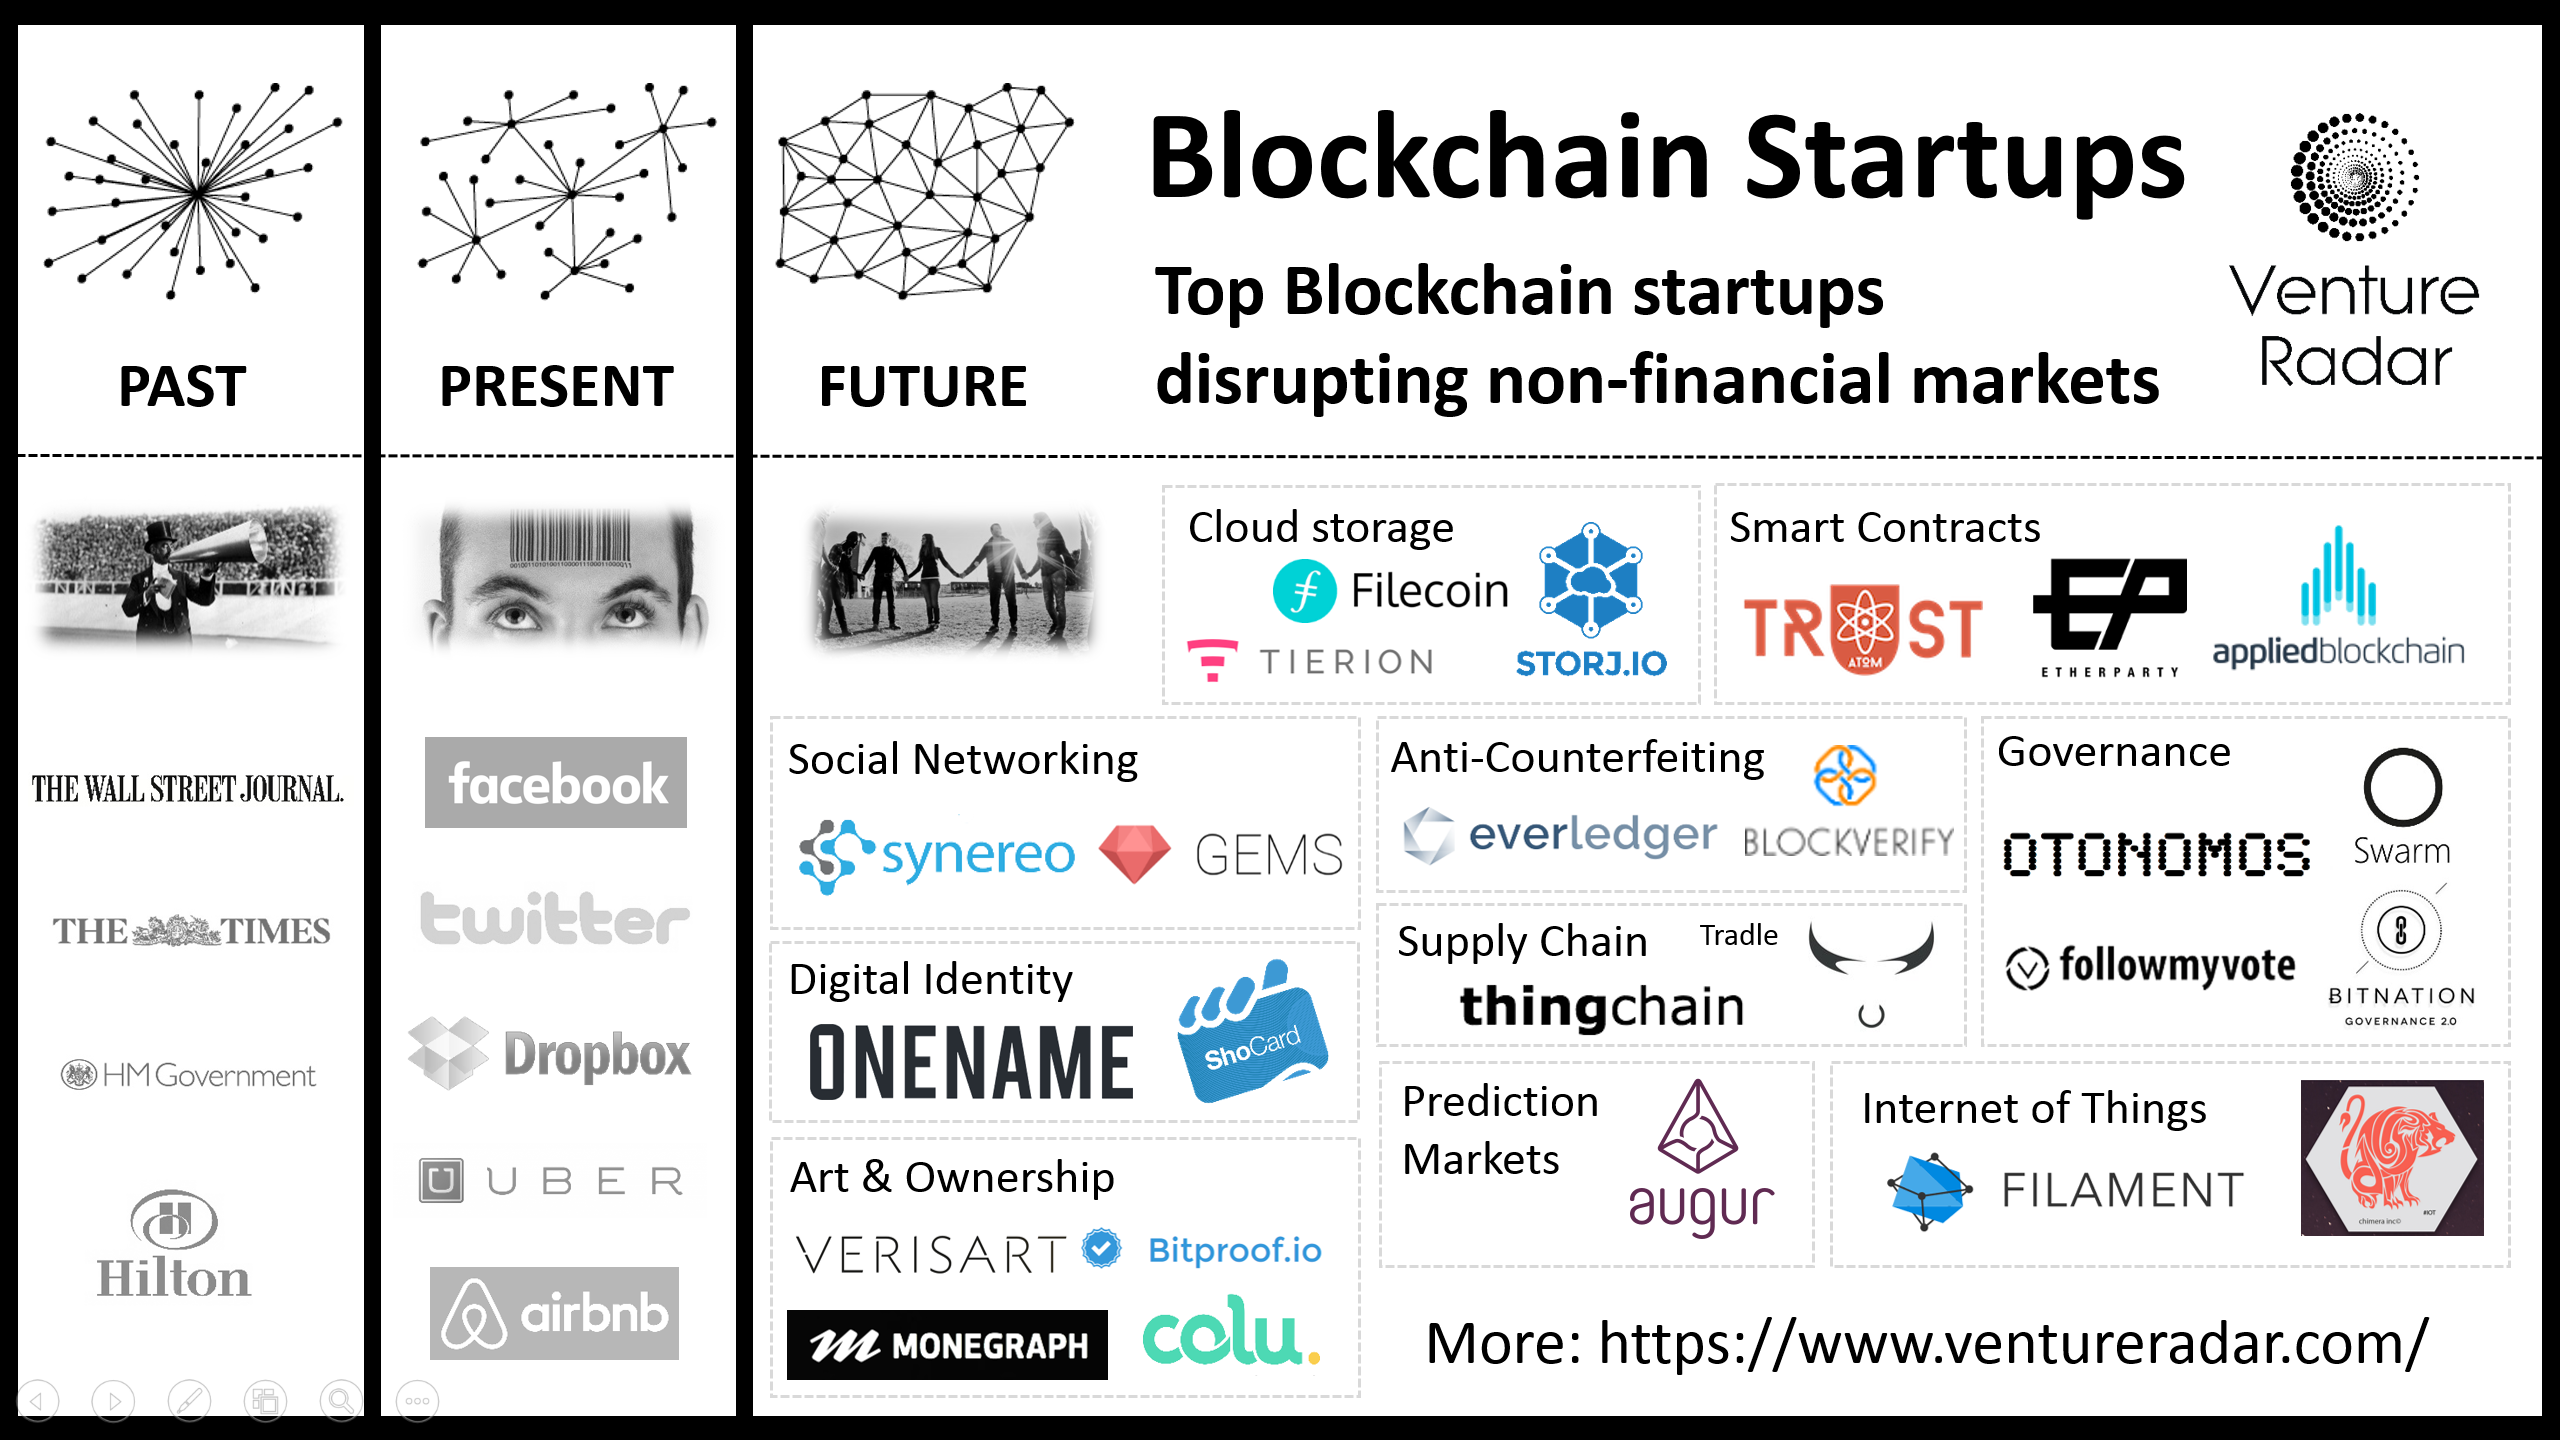 https://images.duckduckgo.com/iu/?u=http%3A%2F%2Fblog.ventureradar.com%2Fwp-content%2Fuploads%2F2015%2F09%2Fblockchain-startupsV2.png&f=1